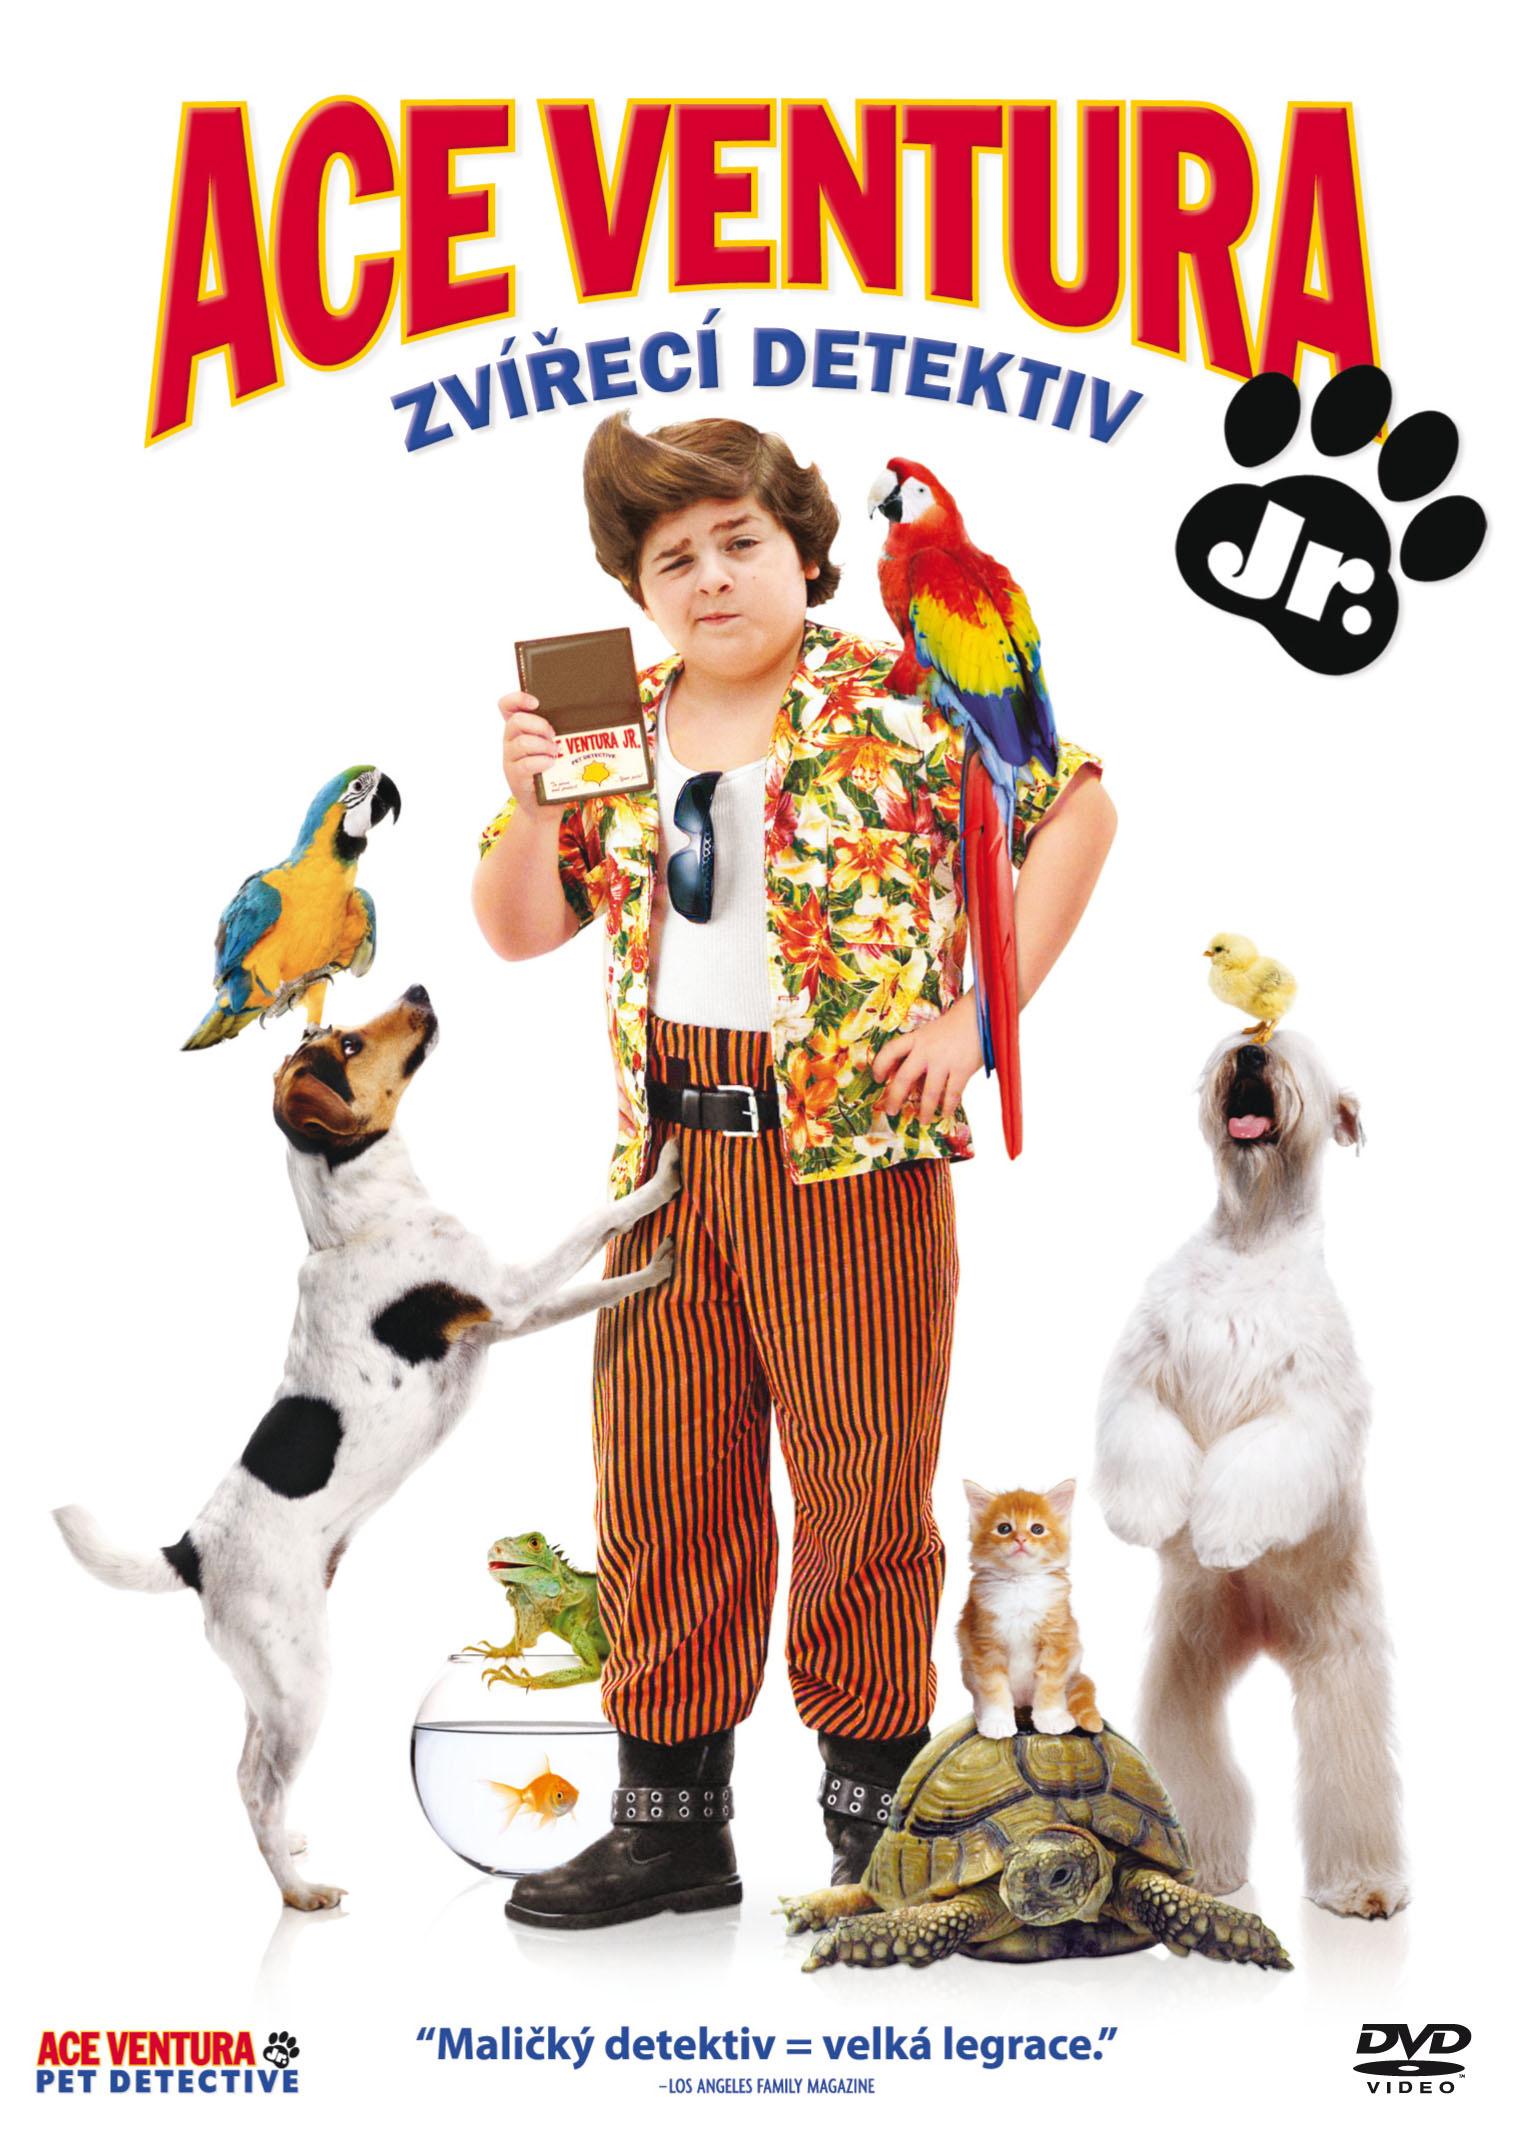 Film Ace Ventura Junior: Zvířecí detektiv ke stažení - Film Ace Ventura Junior: Zvířecí detektiv download